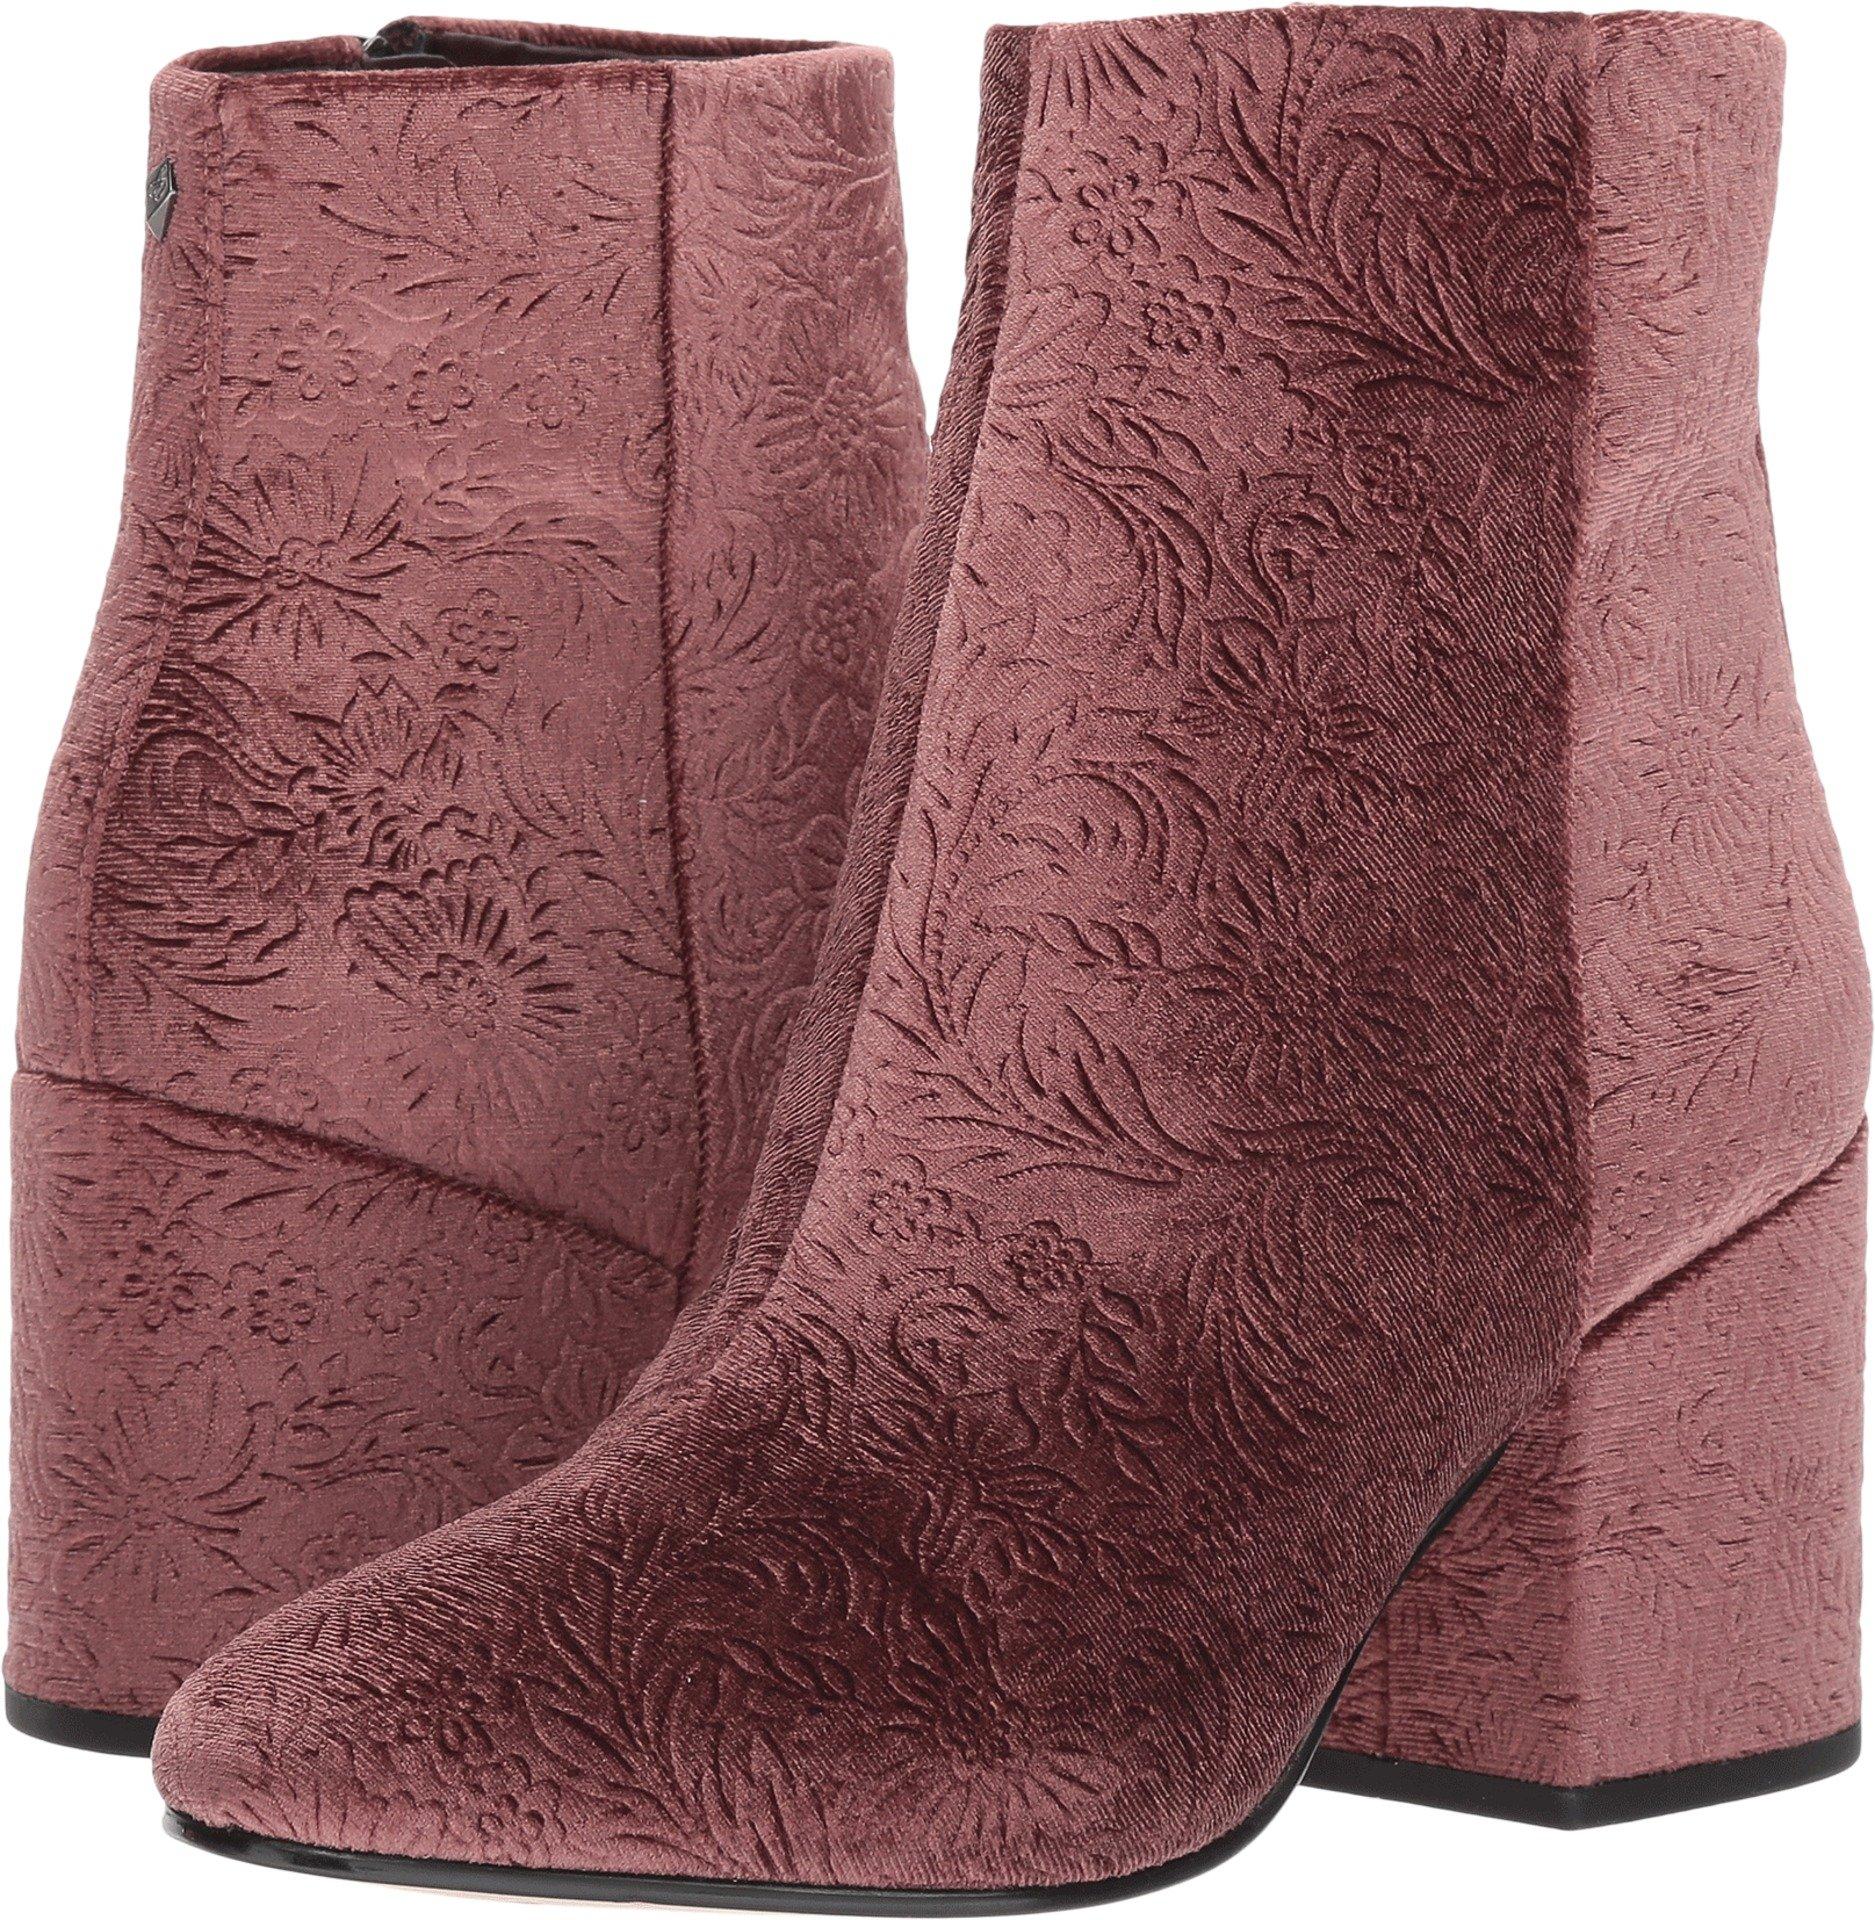 5706fb939689 Galleon - Sam Edelman Women s Taye Ankle Boot